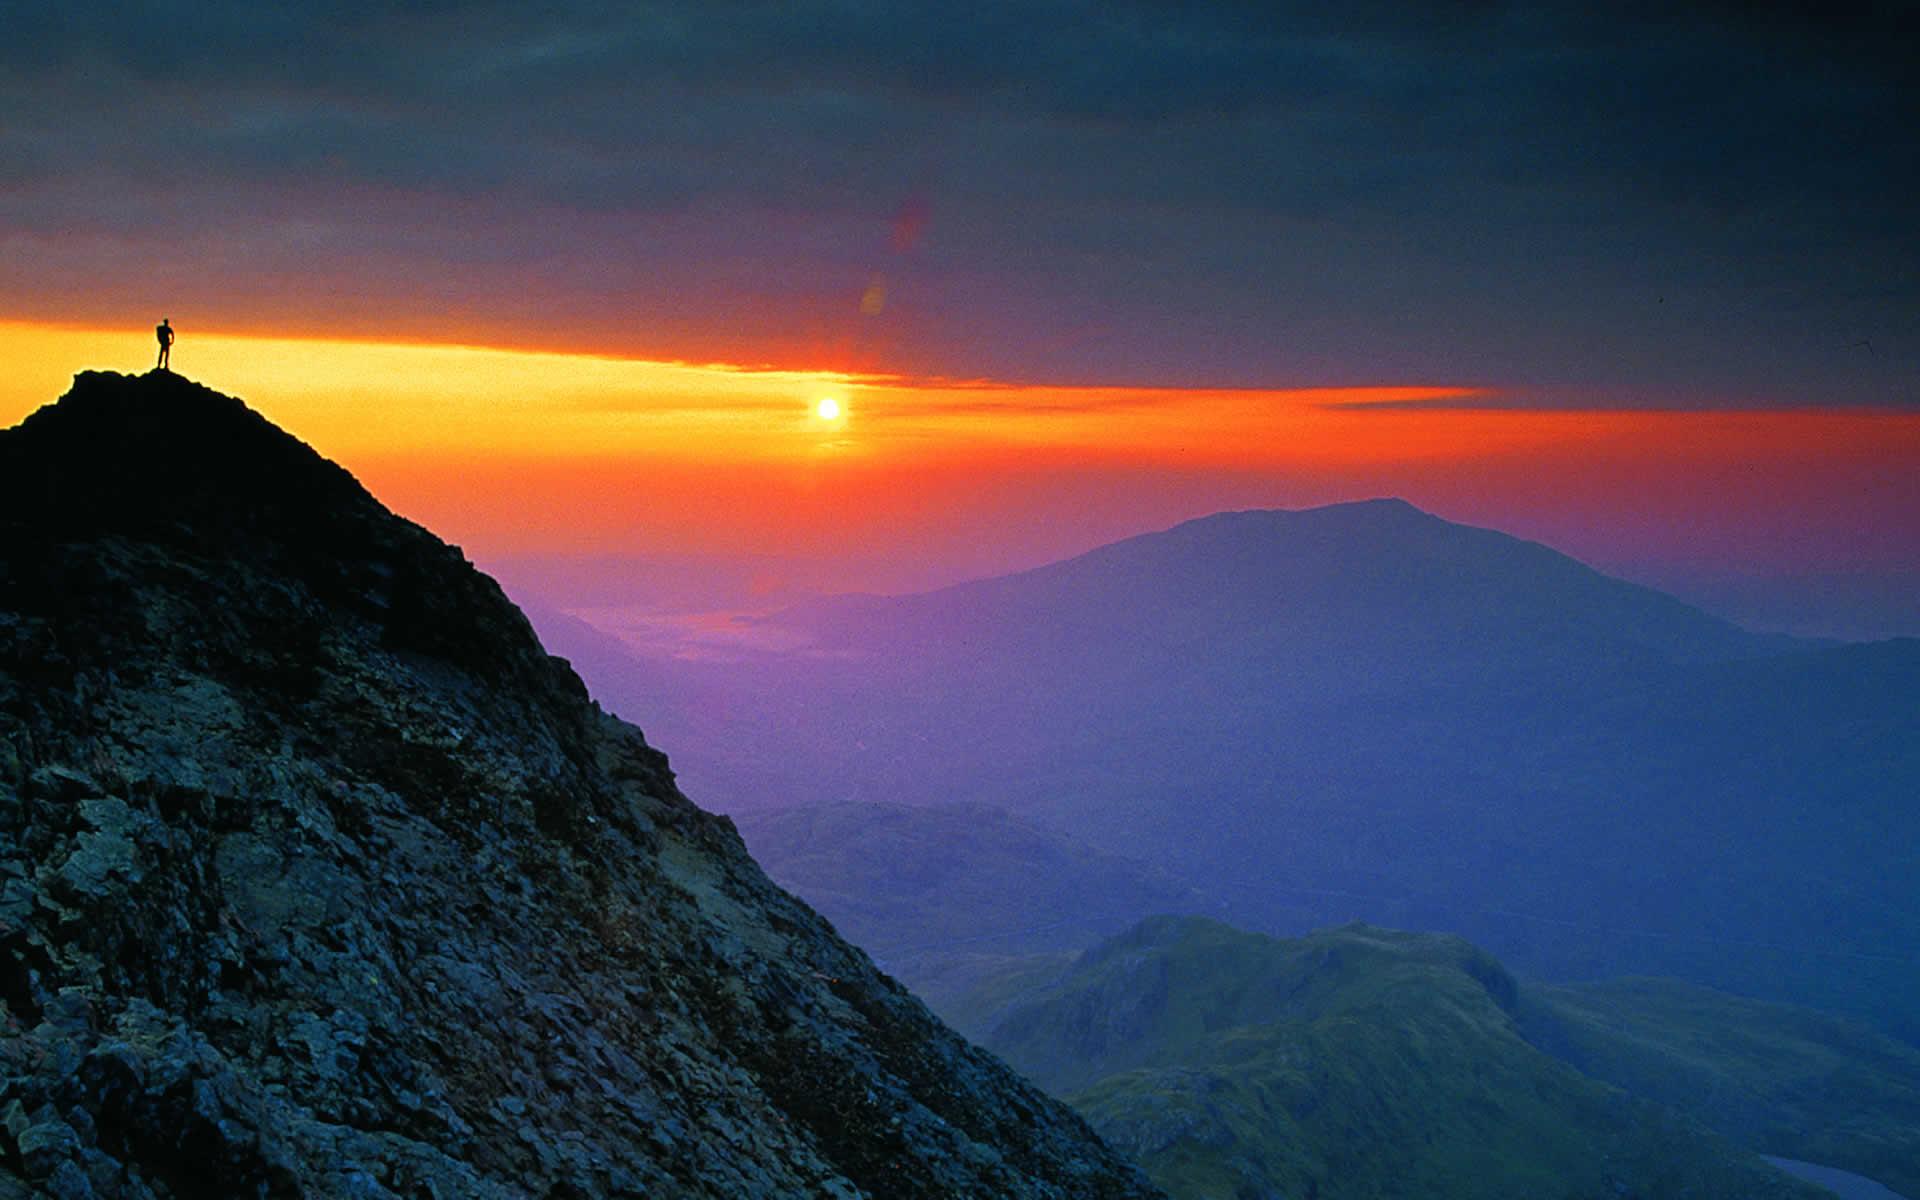 Mountain Background Pictures - WallpaperSafari